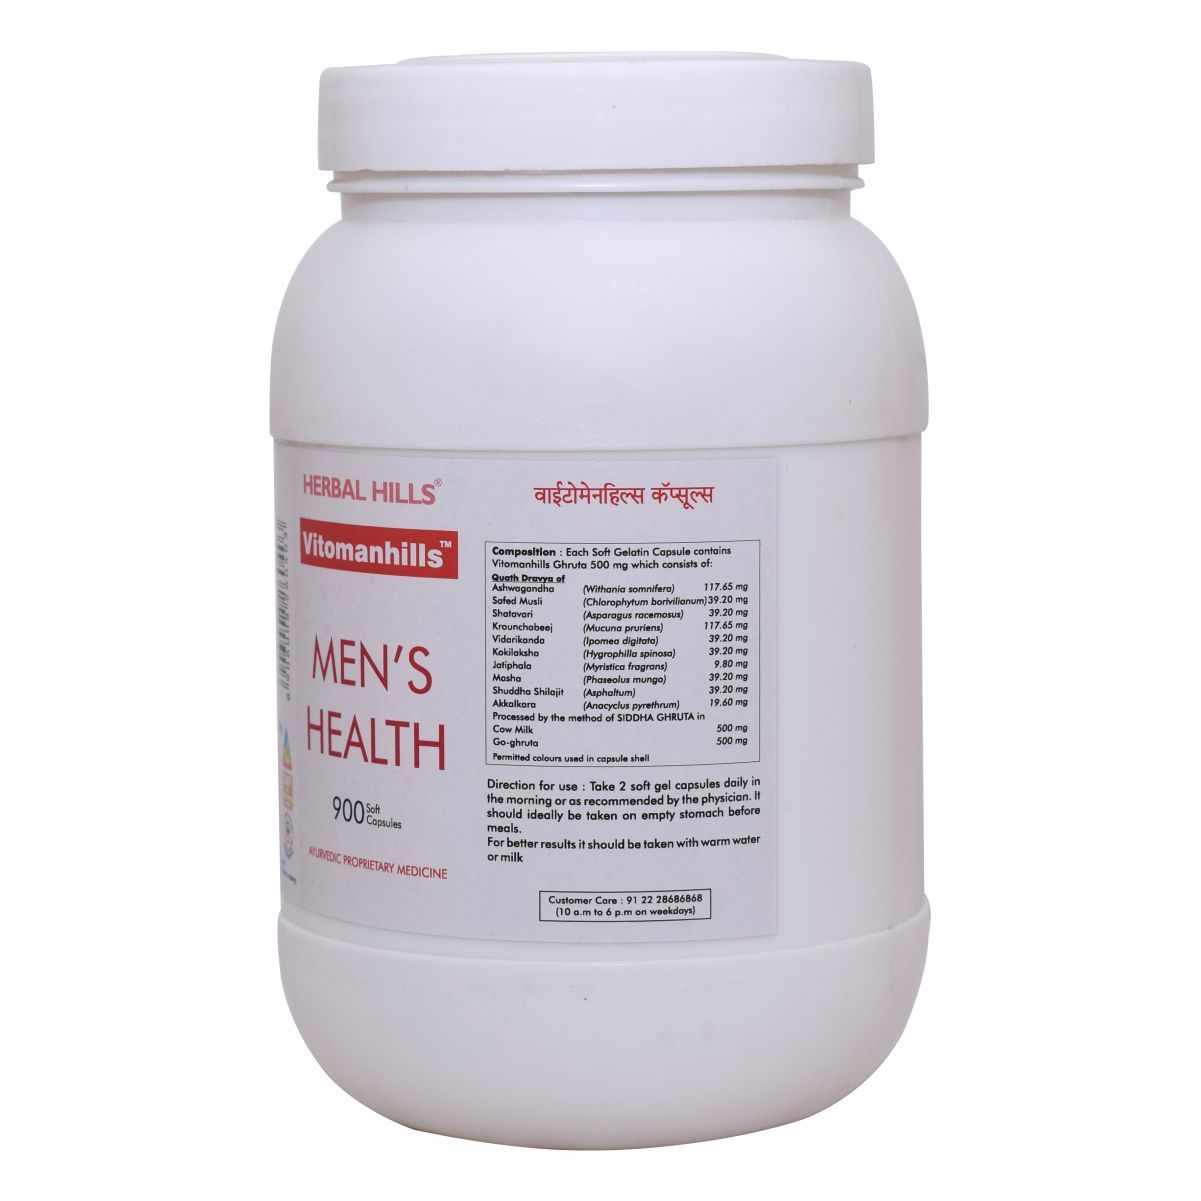 ayurvedic medicines for strength and stamina - Vitomanhills 900 Capsule